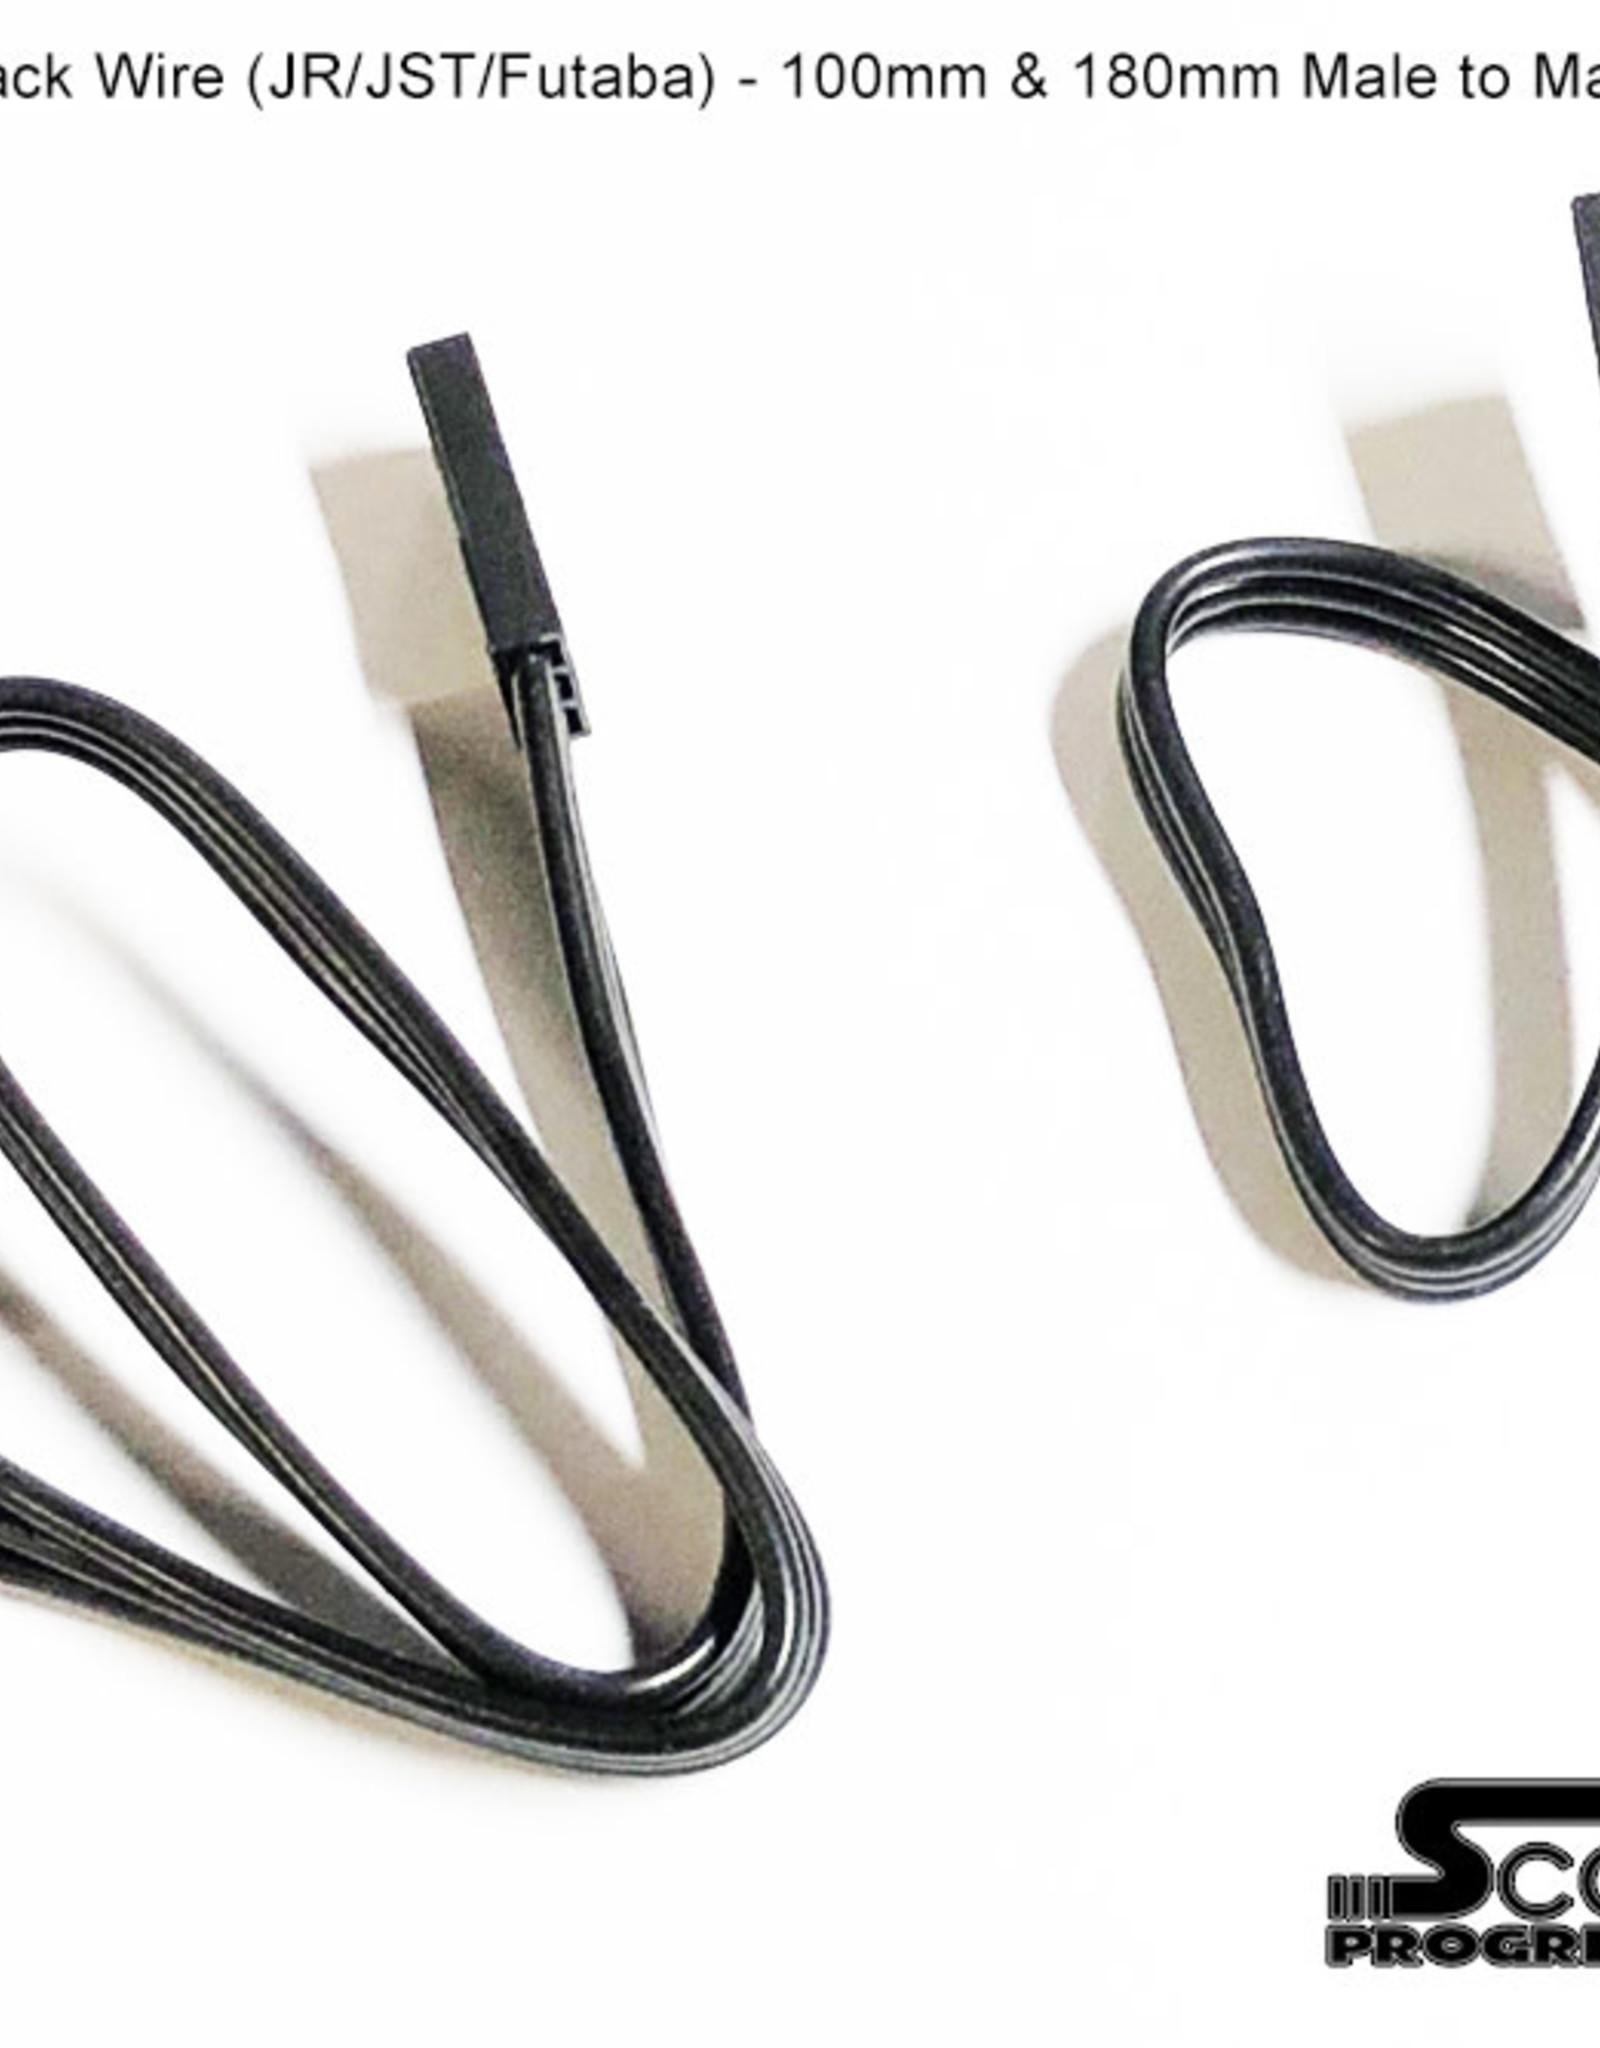 SR700125 ESC Cable 180mm Black by Scale Reflex 700125